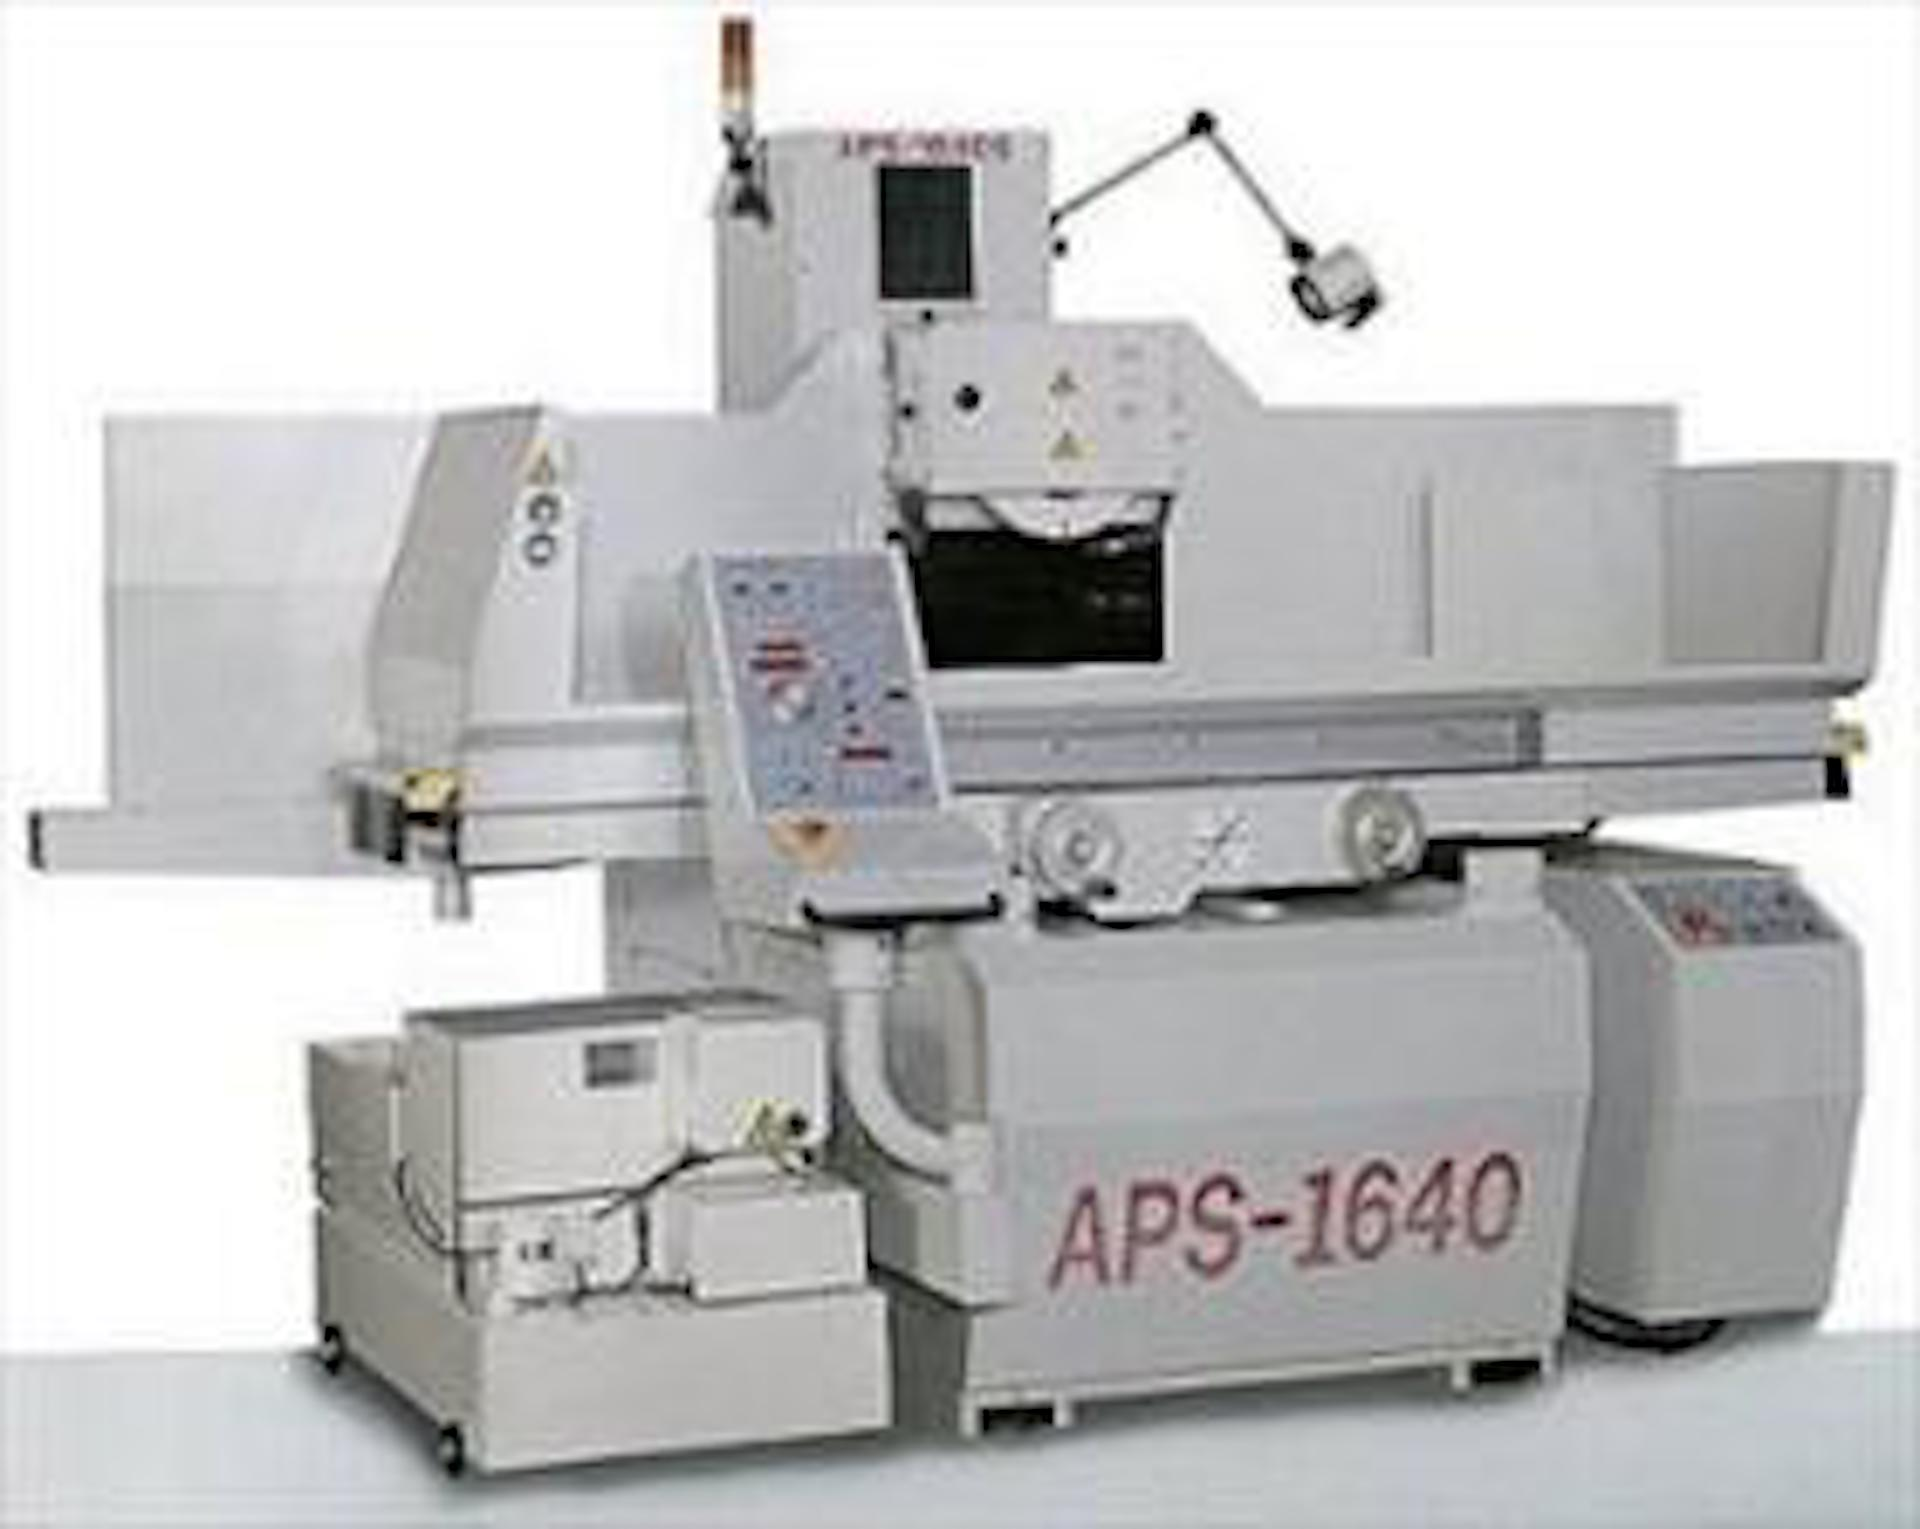 https://www.metalite.co.uk/wp-content/uploads/capabilities/surface-grinding/Seedtec-AHD-1640-surface-grinder.jpg